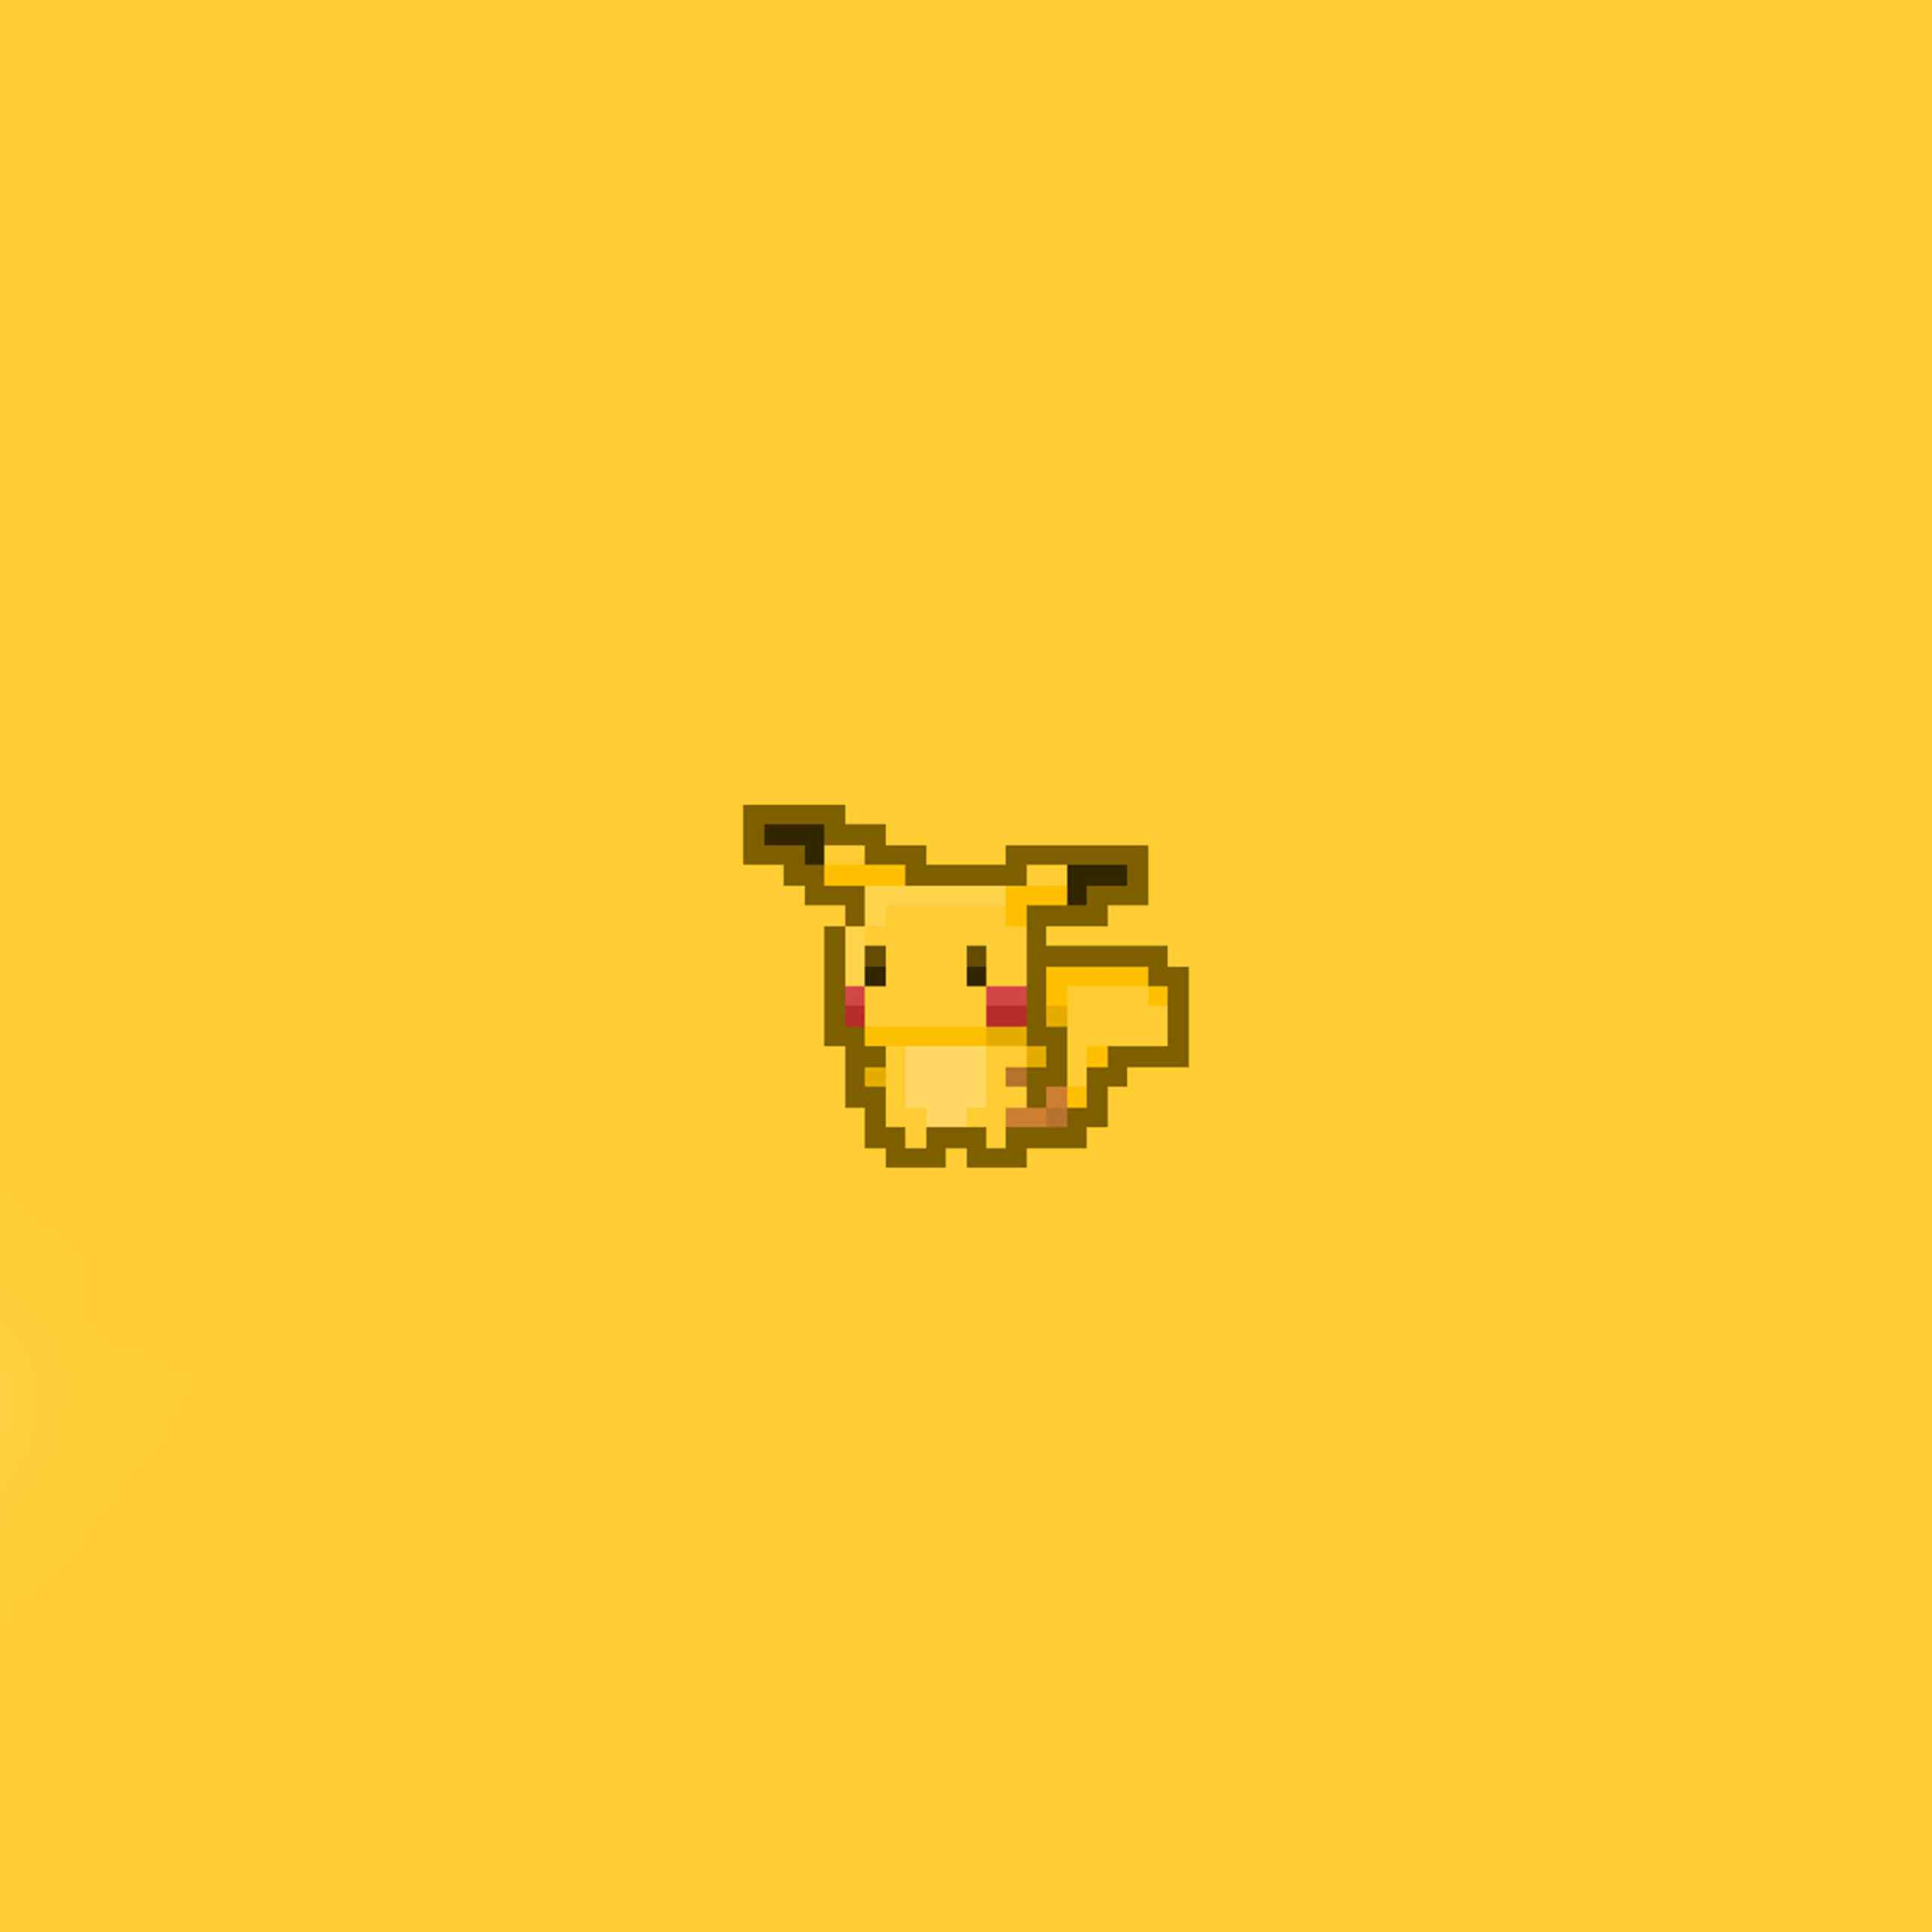 Wallpaper iphone kuning - Pikachu Permainan Kuning